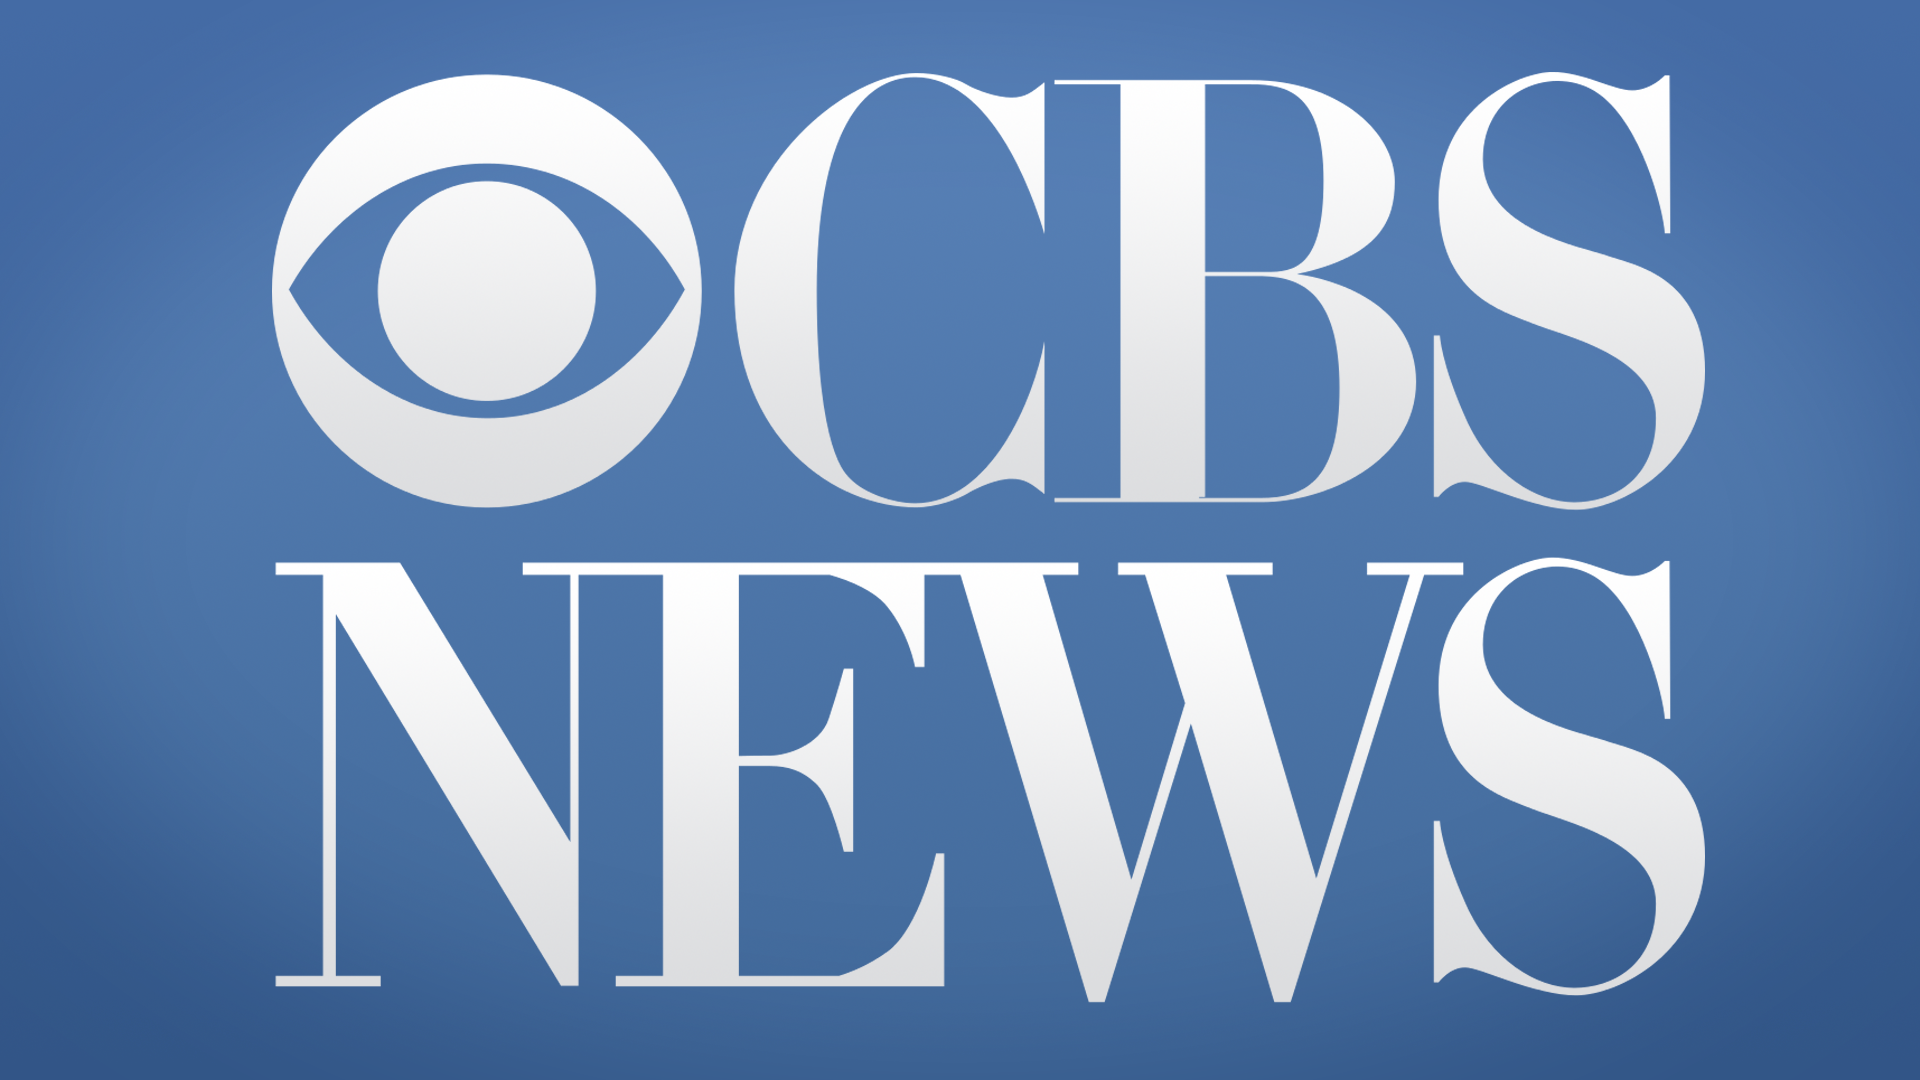 KELO CBS News Logo